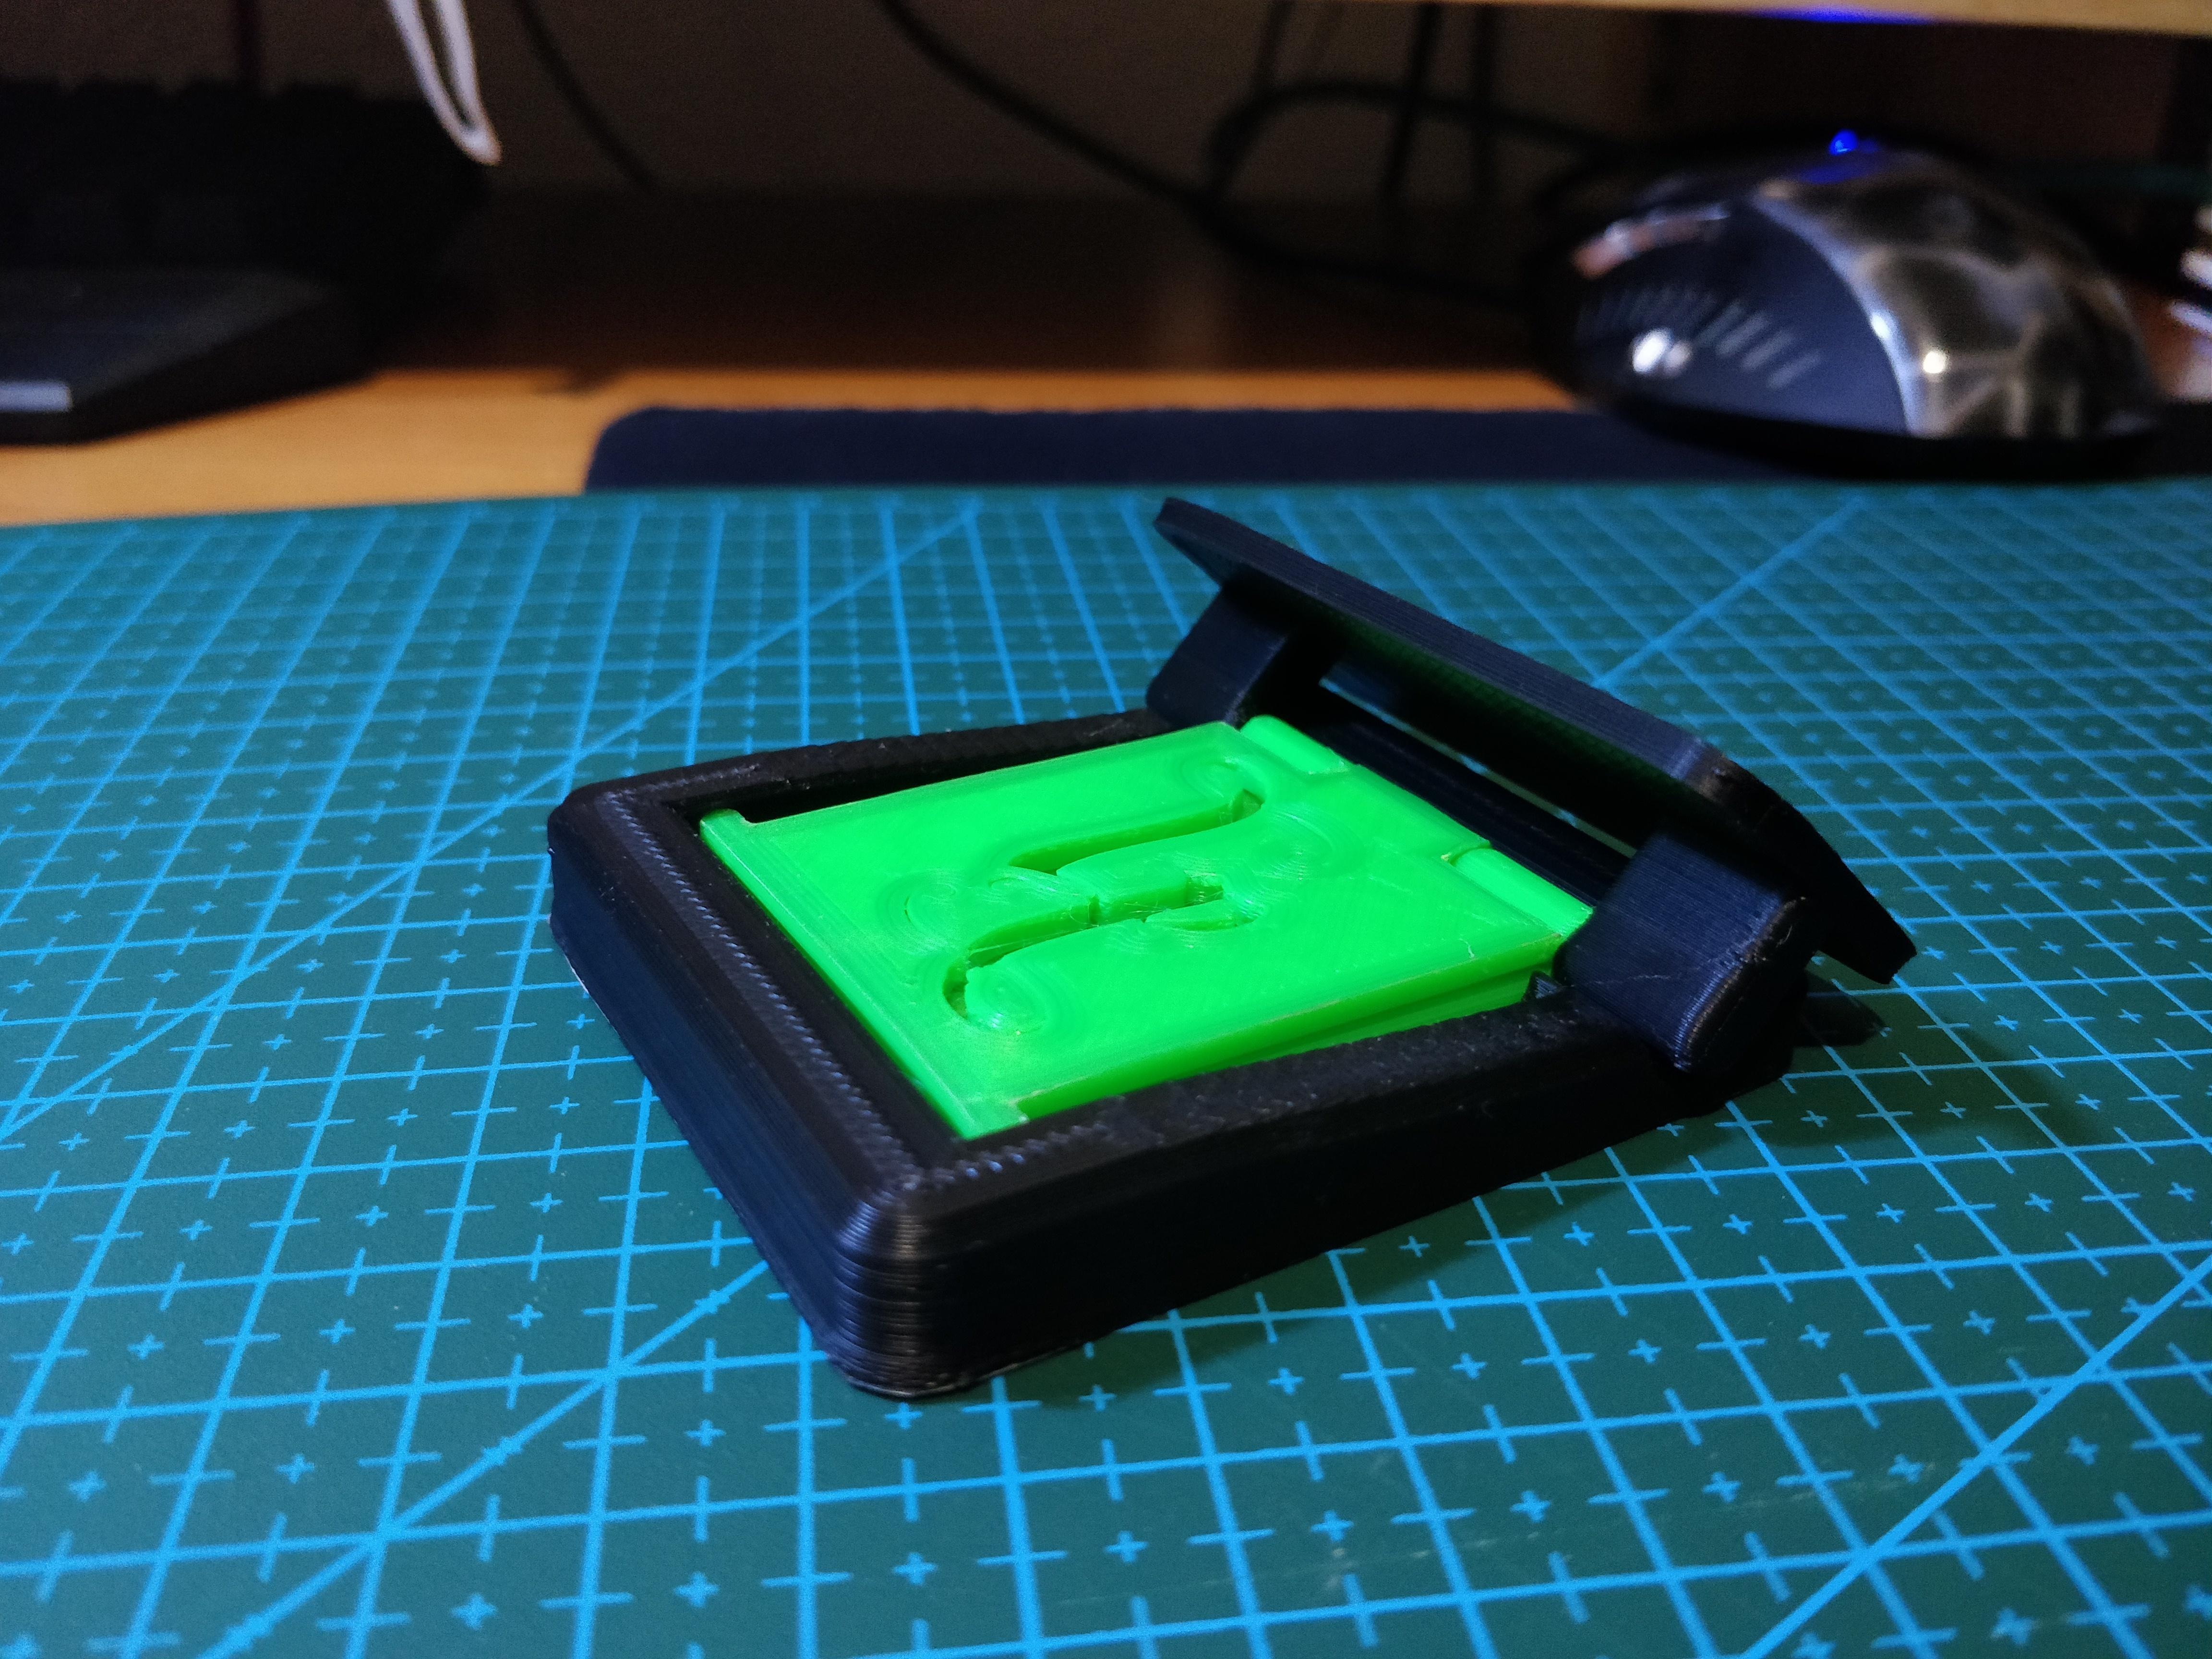 laptopStand1_7.jpg Download free STL file Adjustable Laptop Stand [WIP] • 3D printable template, Kliffom